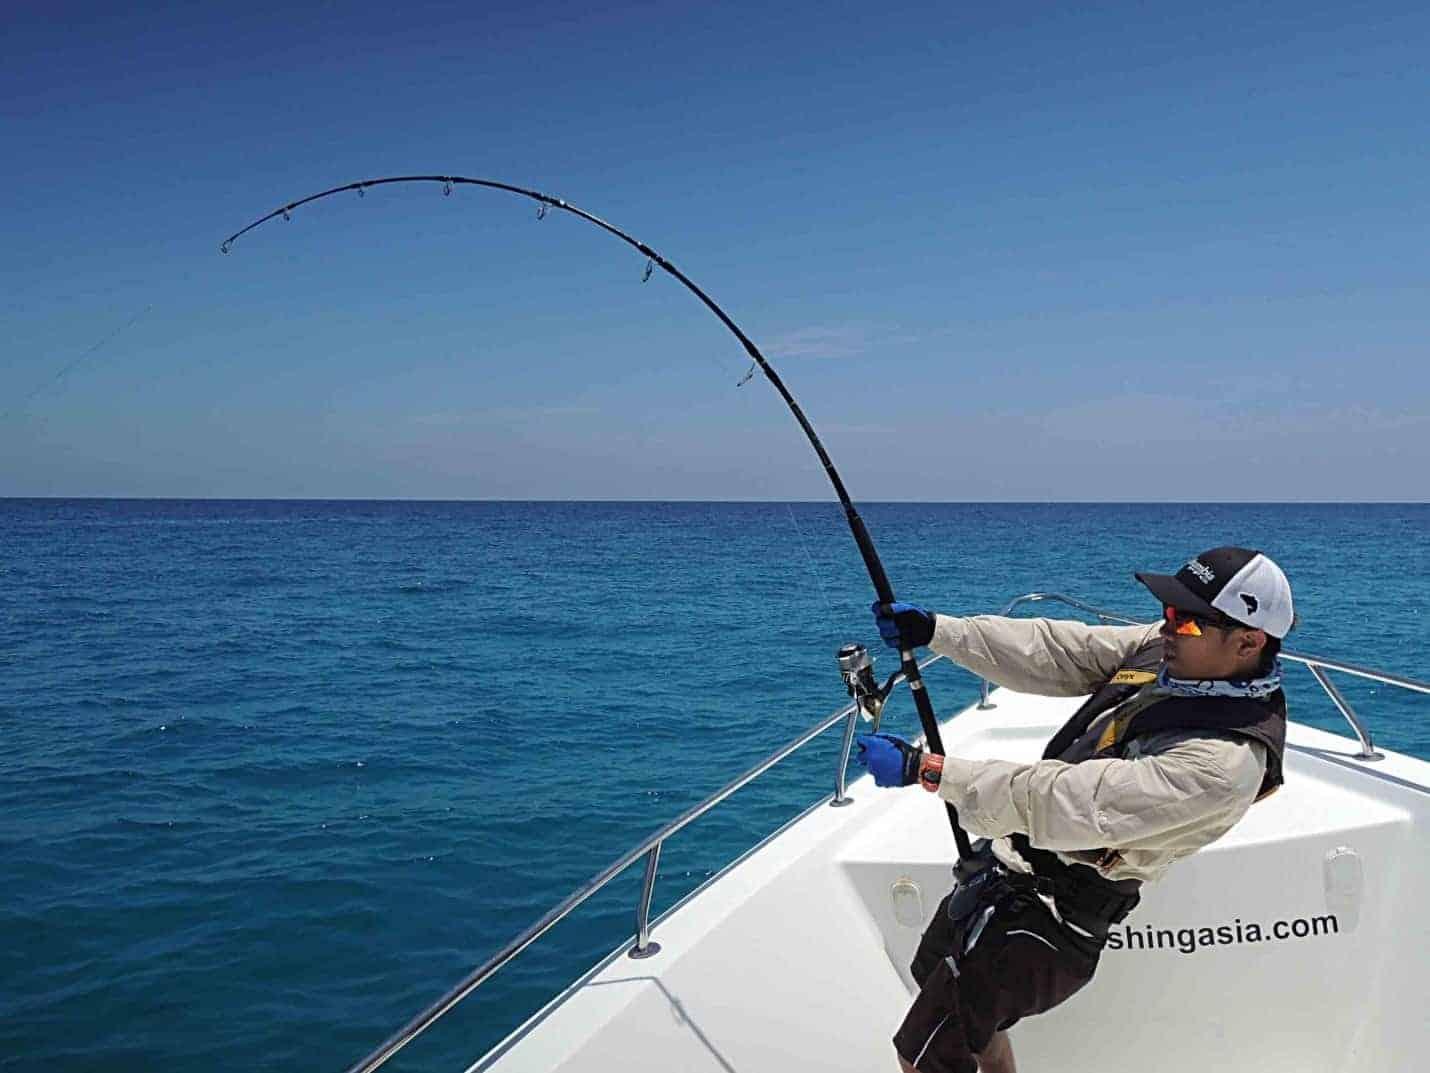 saltwater fishing gear